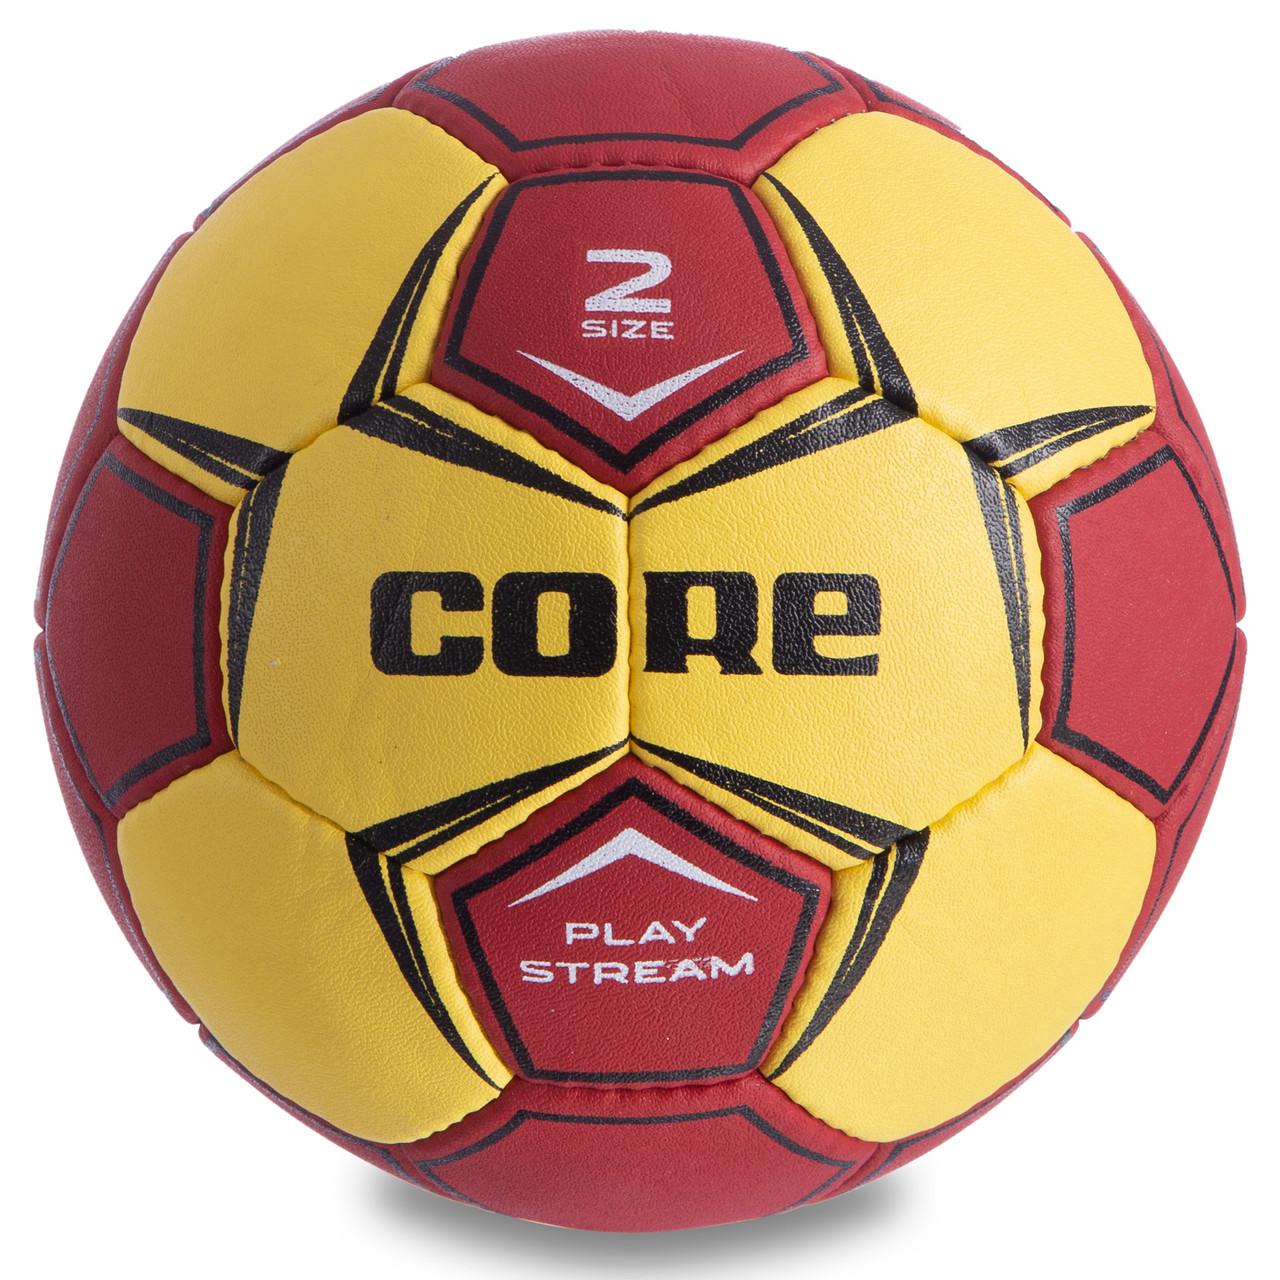 Мяч гандбольный размер 2 CORE PU PLAY STREAM CRH-049-2